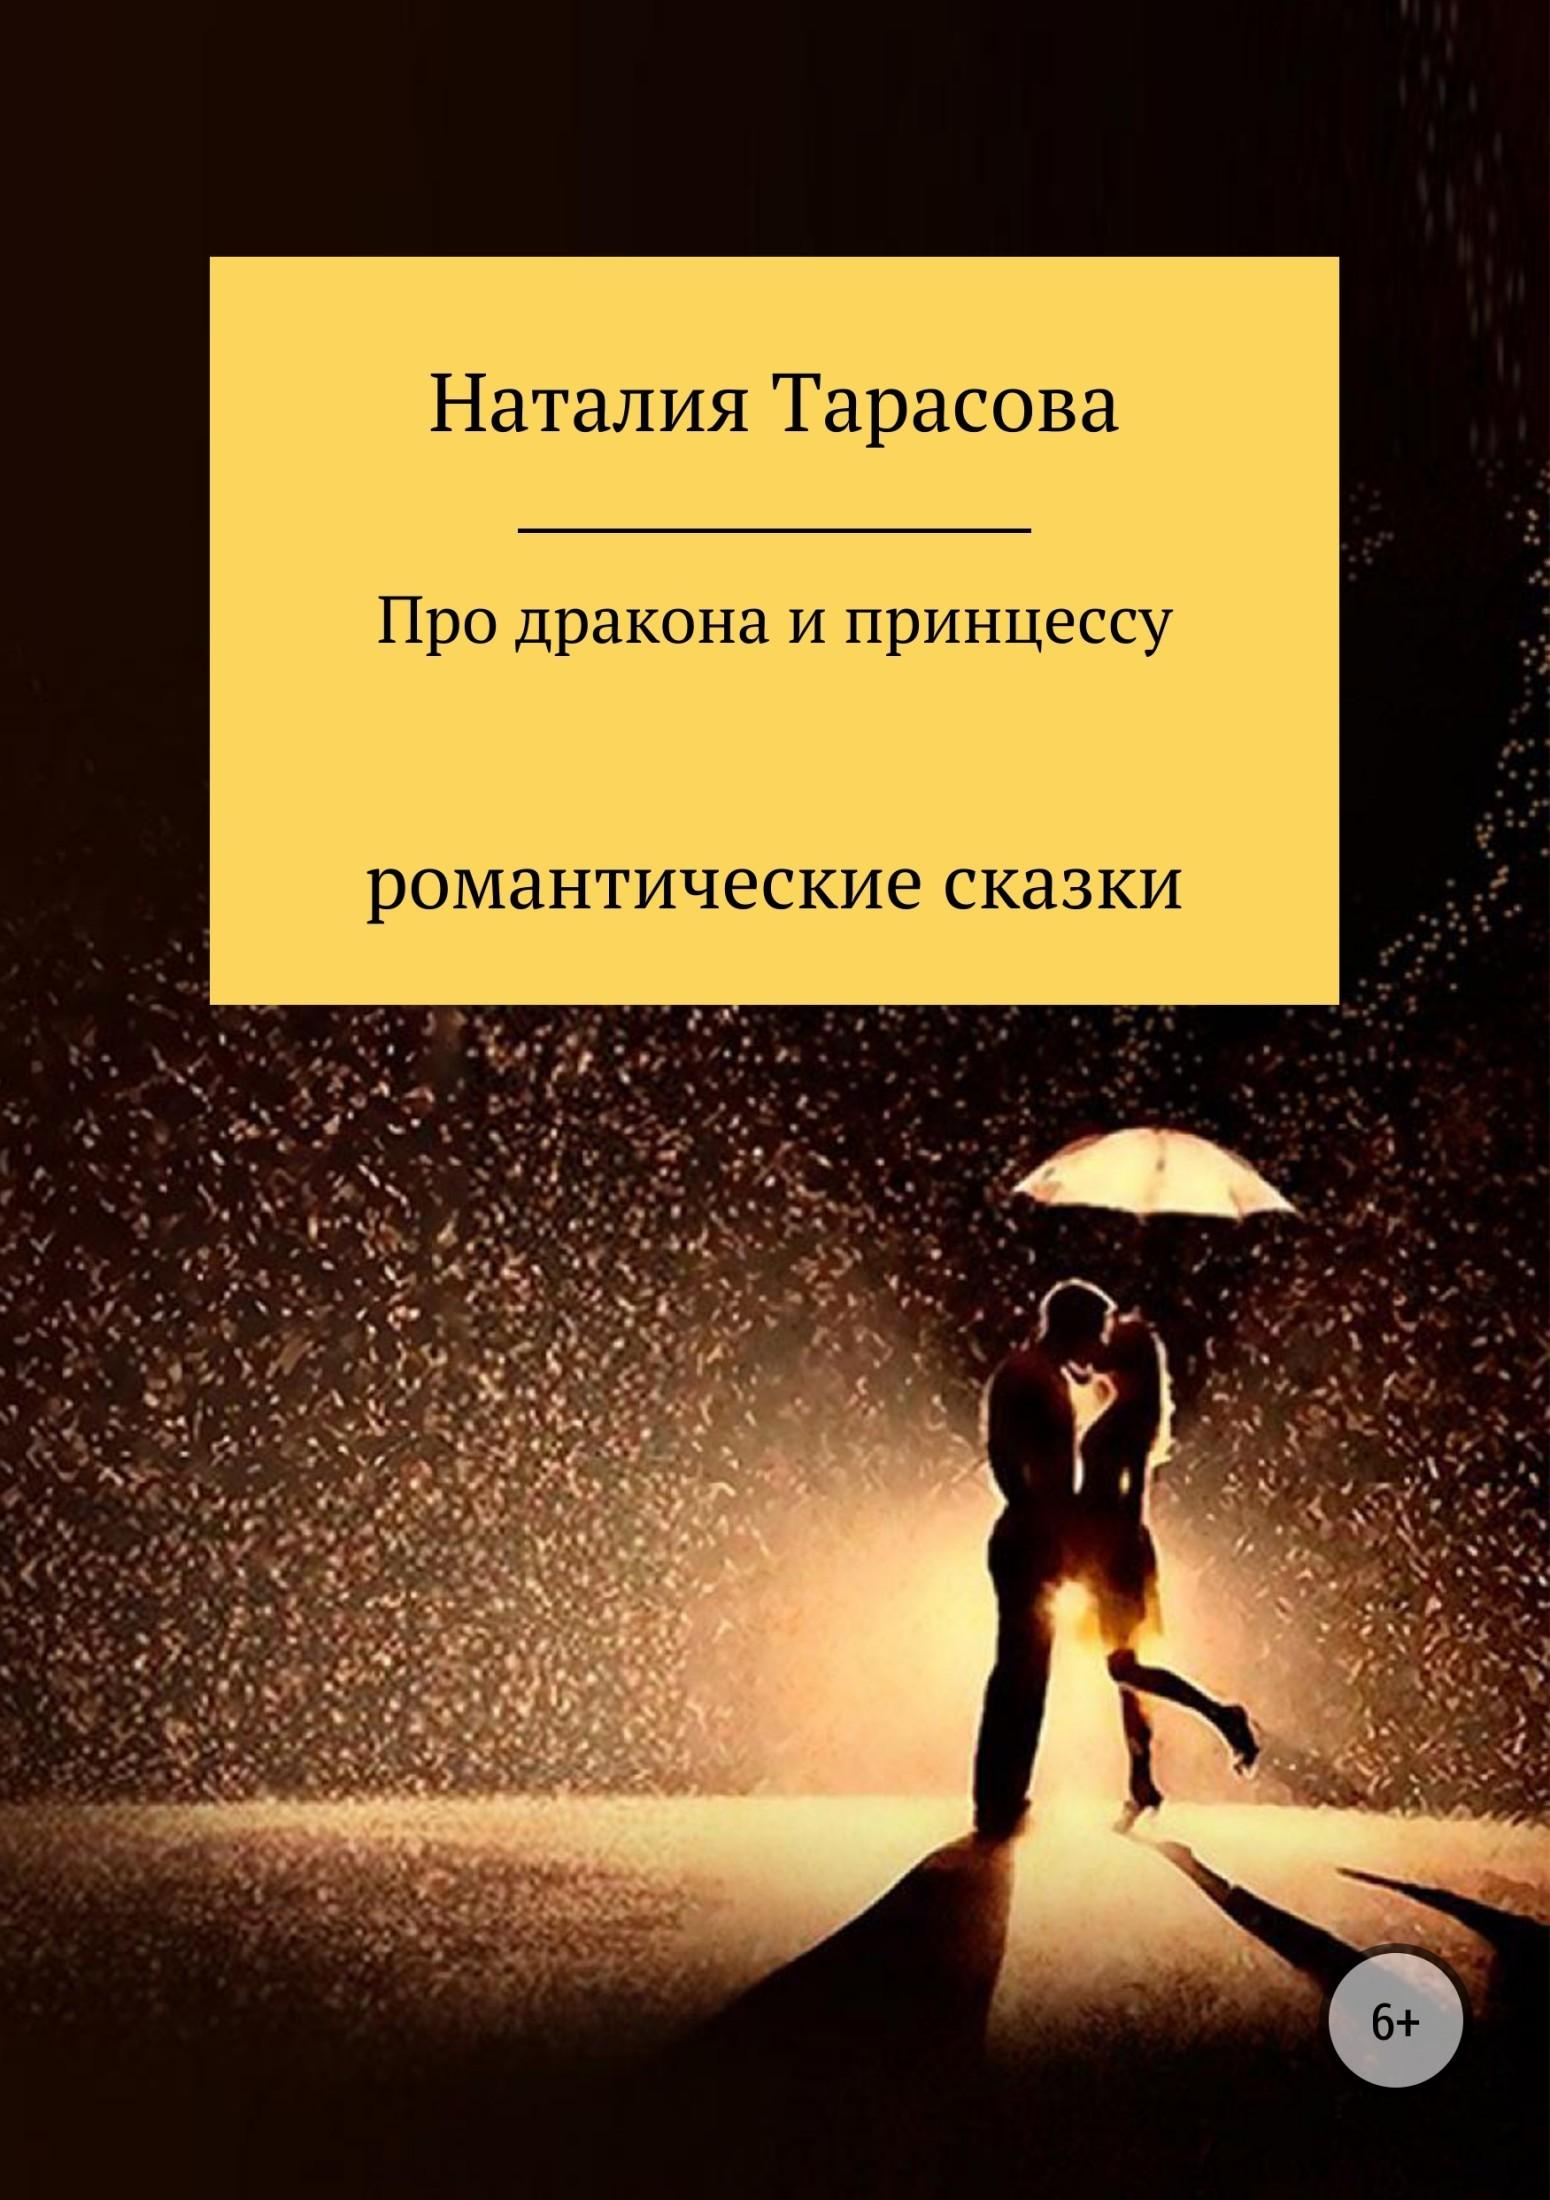 Наталия Тарасова - Про дракона и принцессу